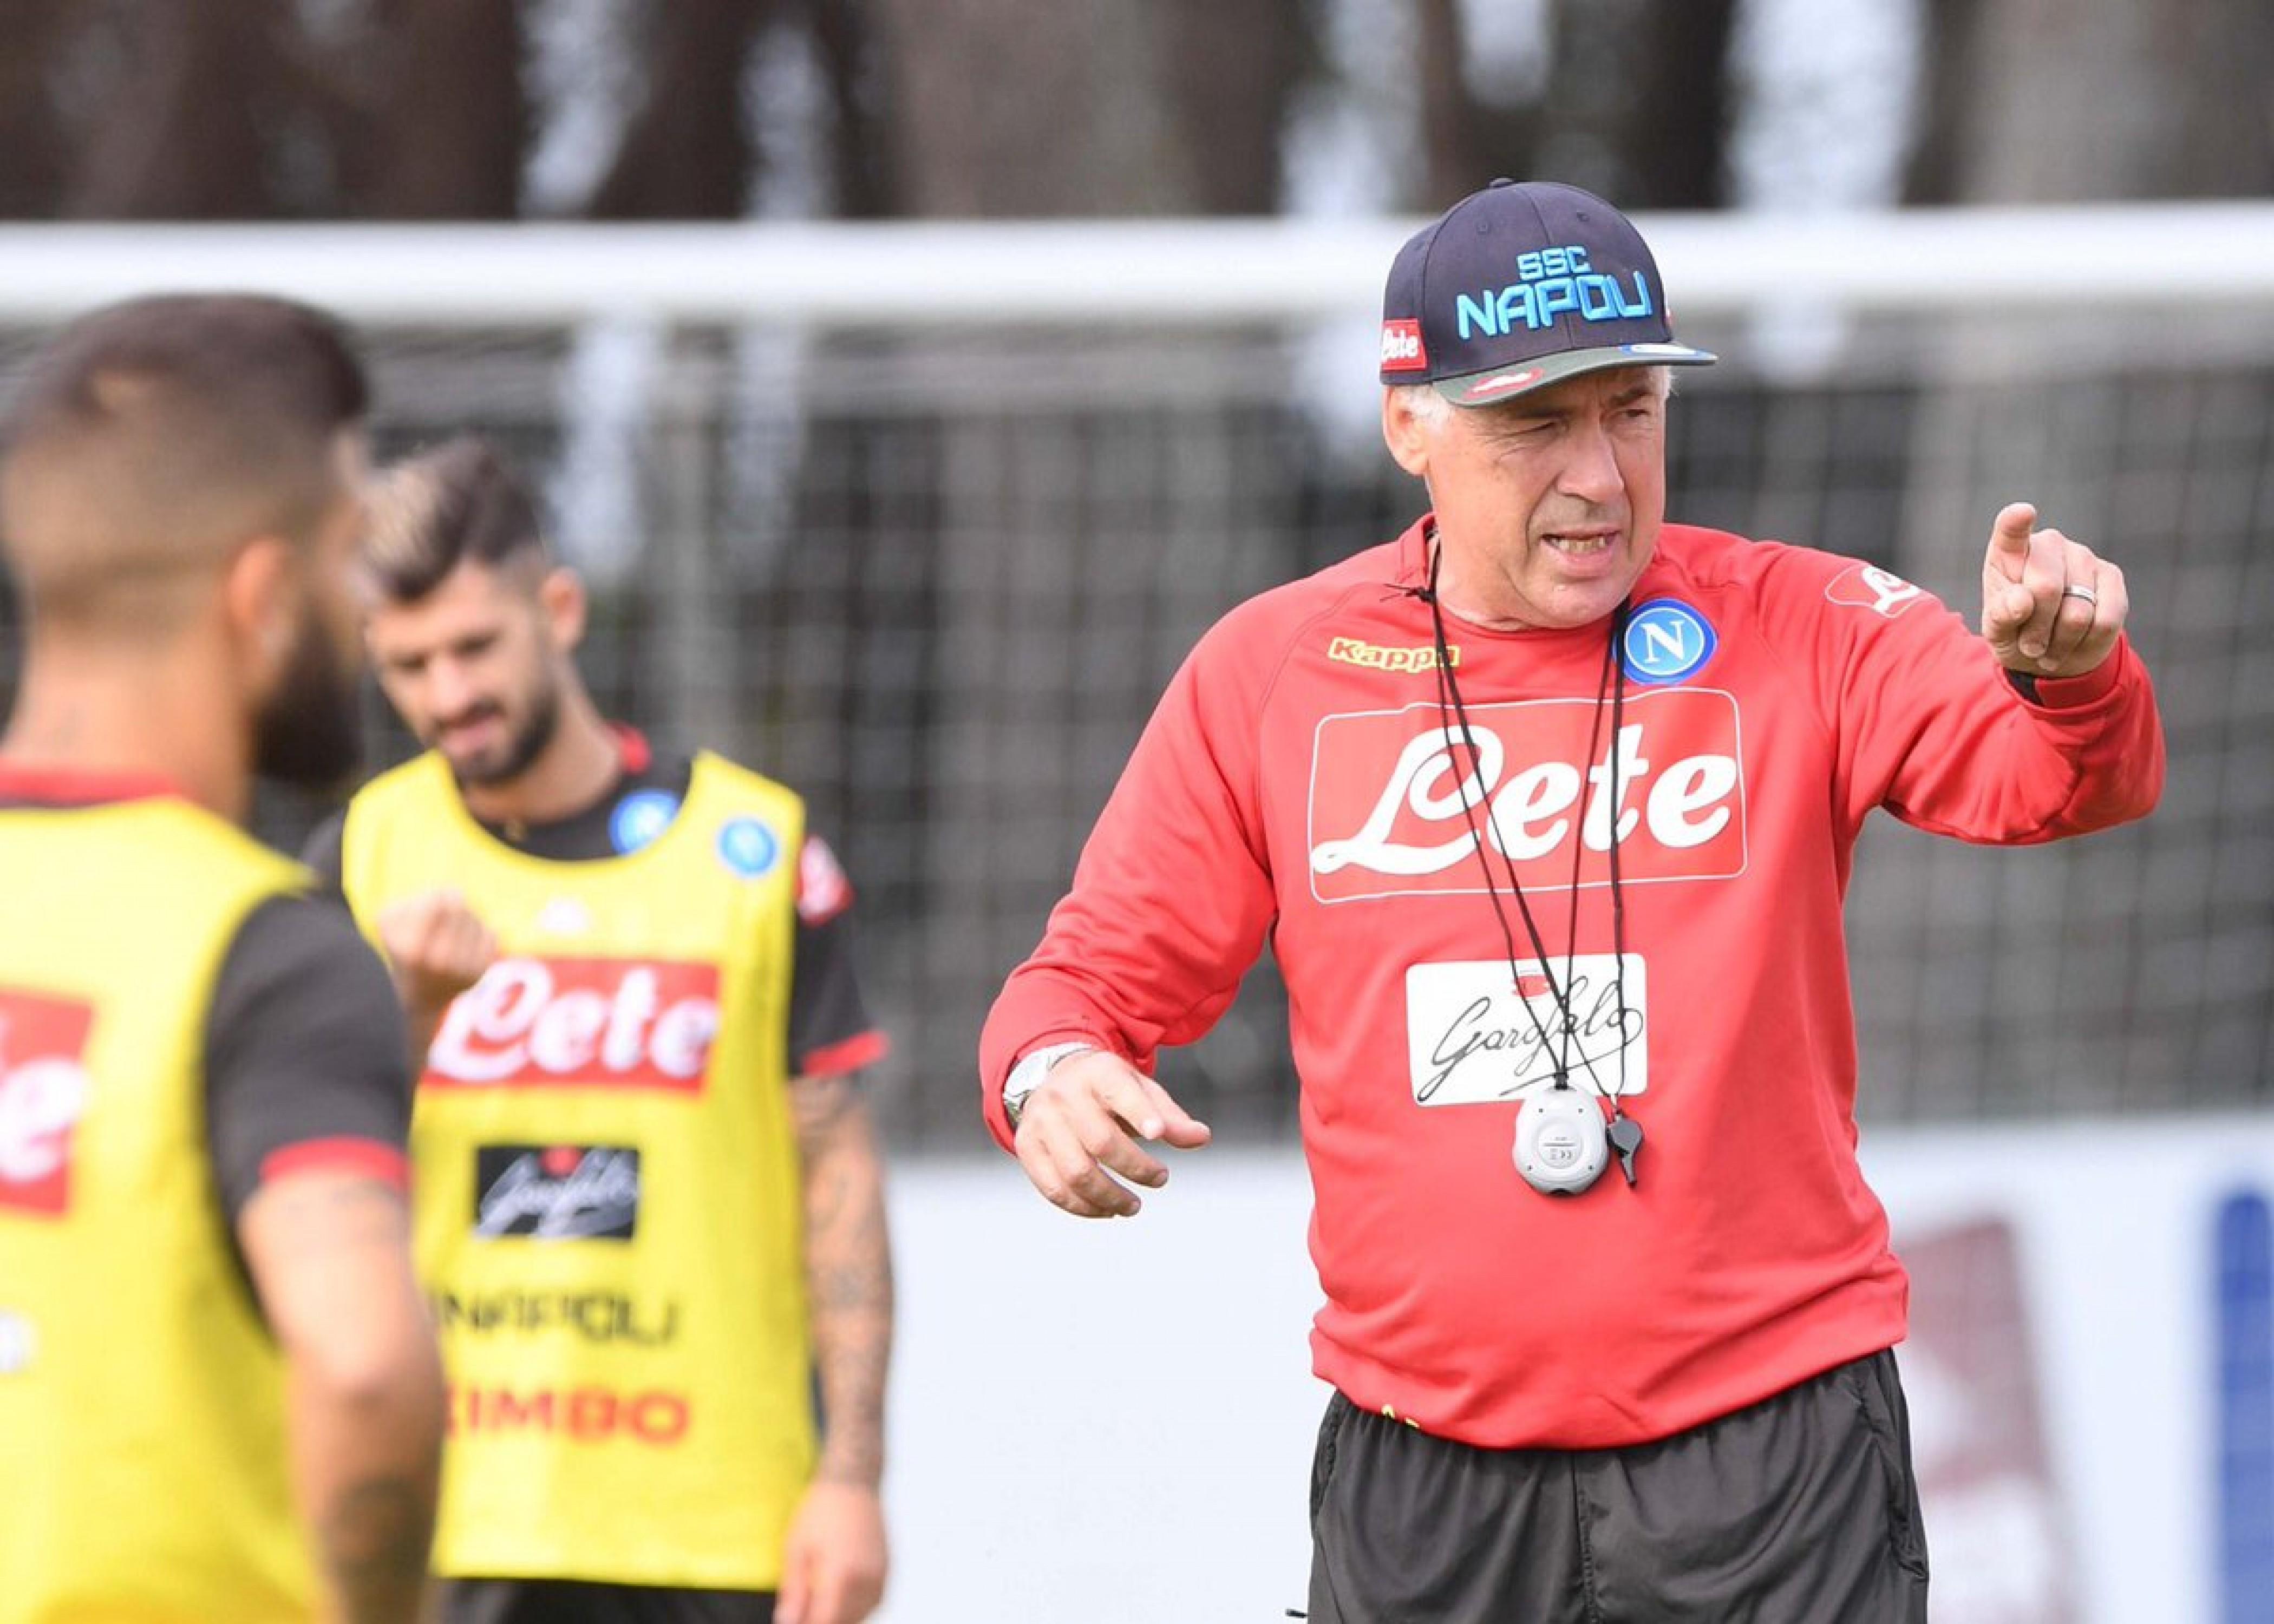 Serie A - Fra Torino e Napoli sarà guerra per i 3 punti